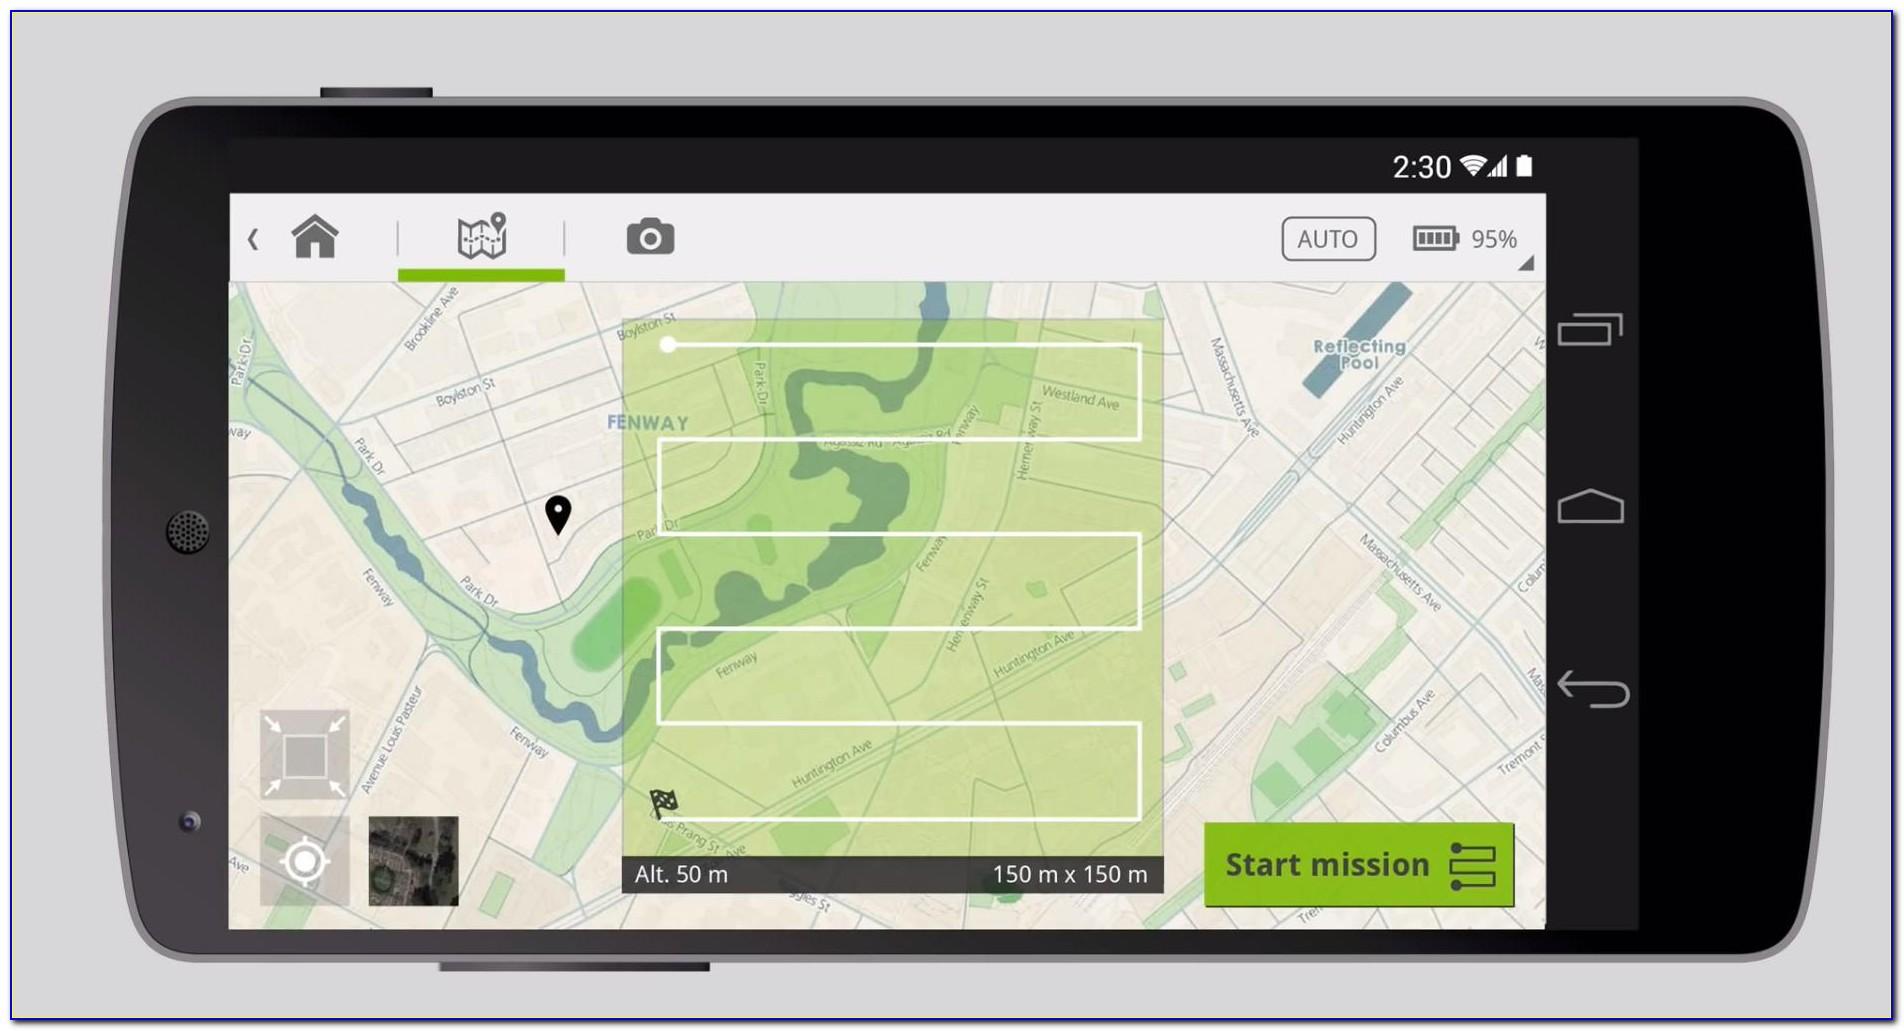 Dji Mapping Software Free